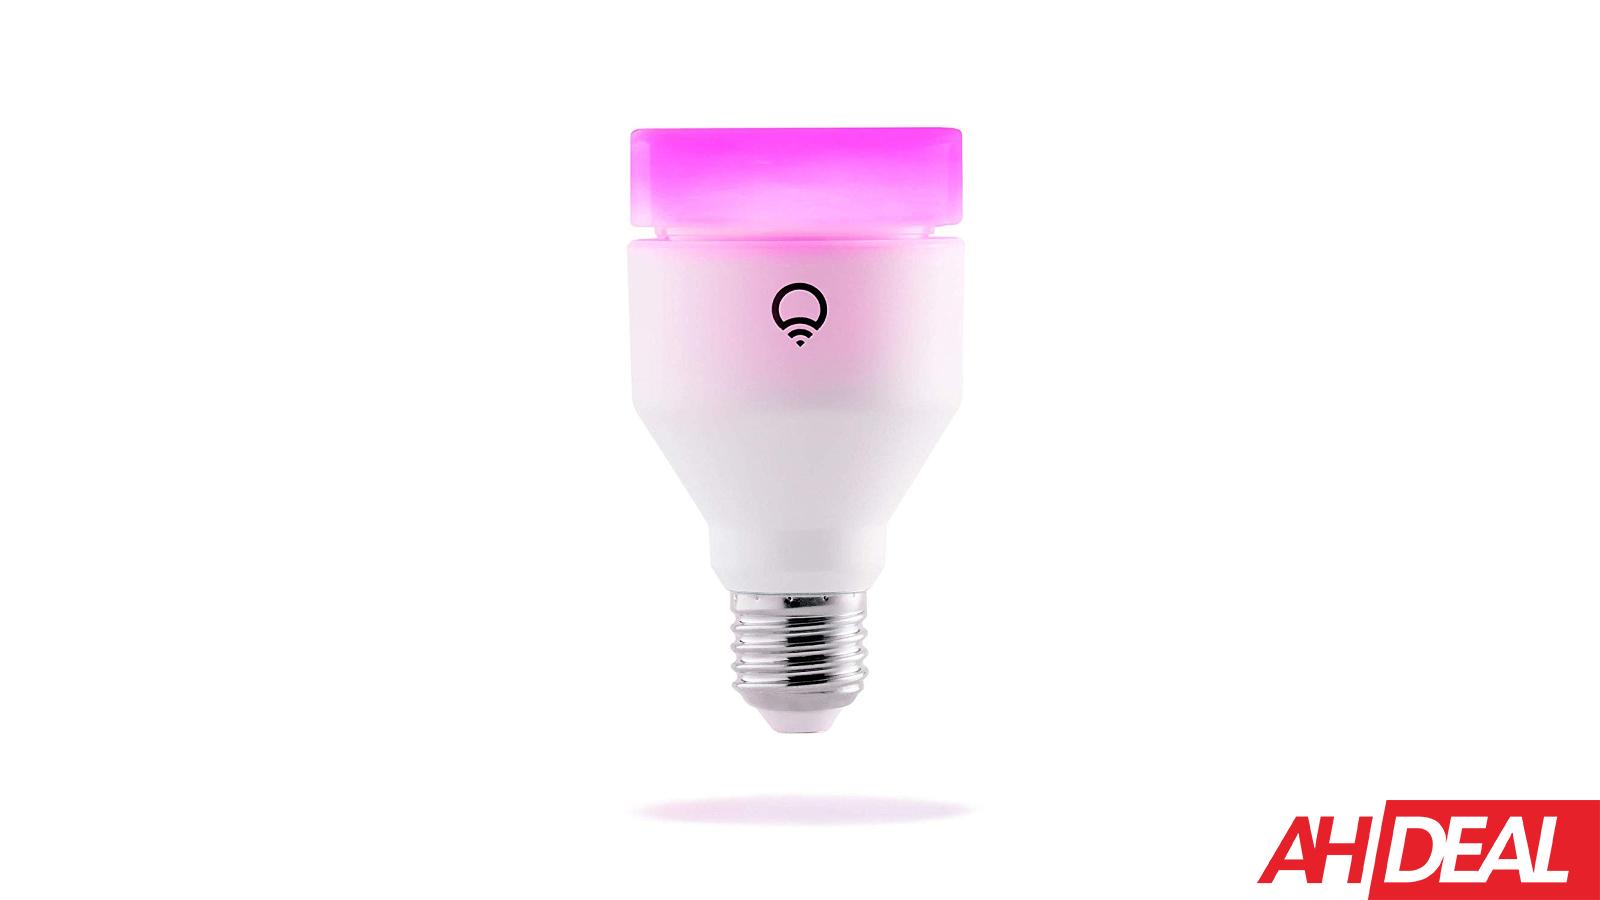 LIFX (A19) WiFi Smart Light Bulbs $45 – Amazon 12 Days of Deals 2018